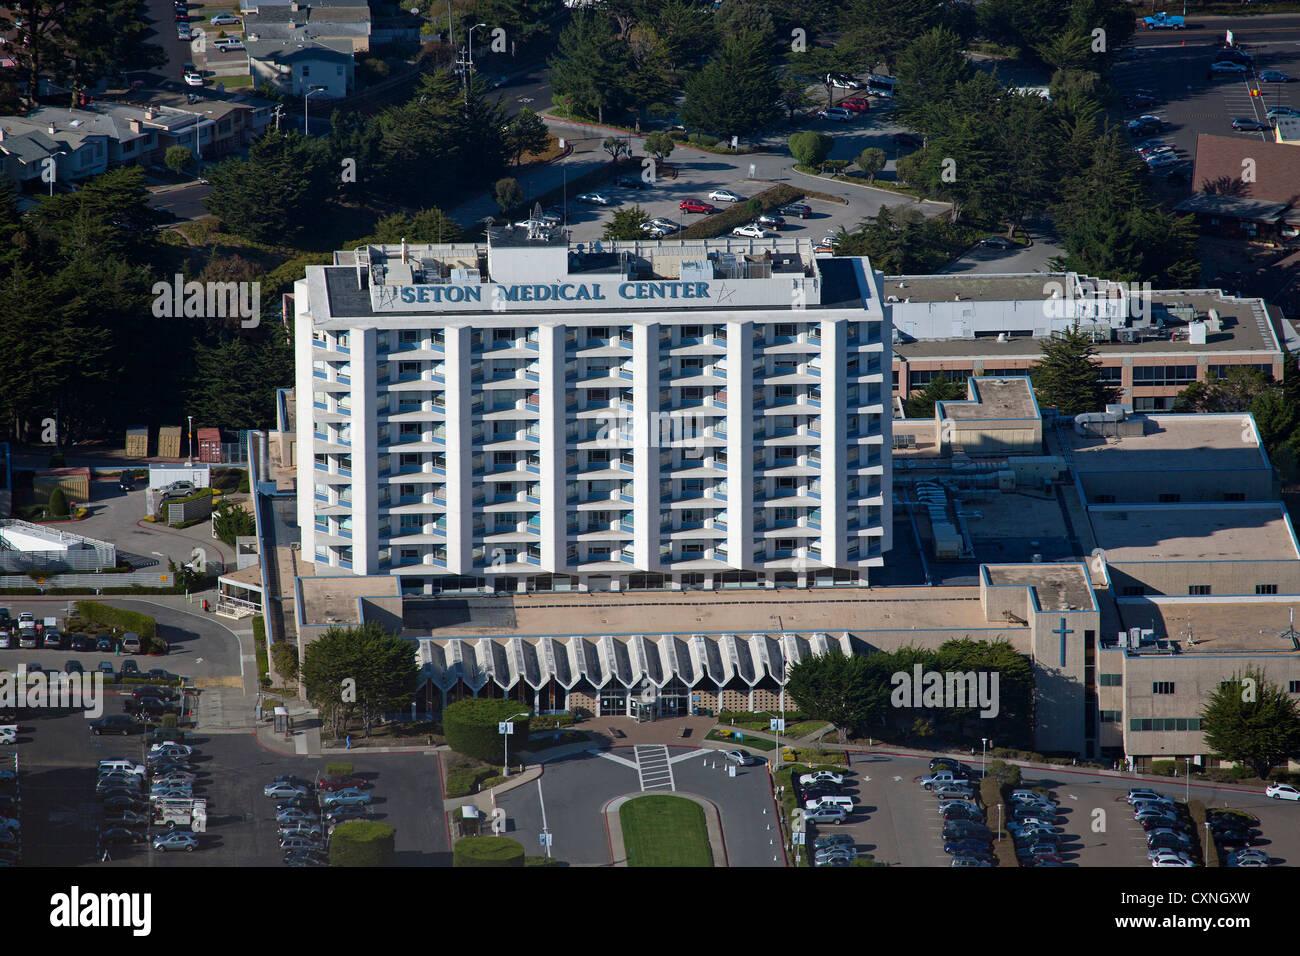 Fotografía aérea Seton Medical Center, Daly City, el condado de San Mateo, California Imagen De Stock